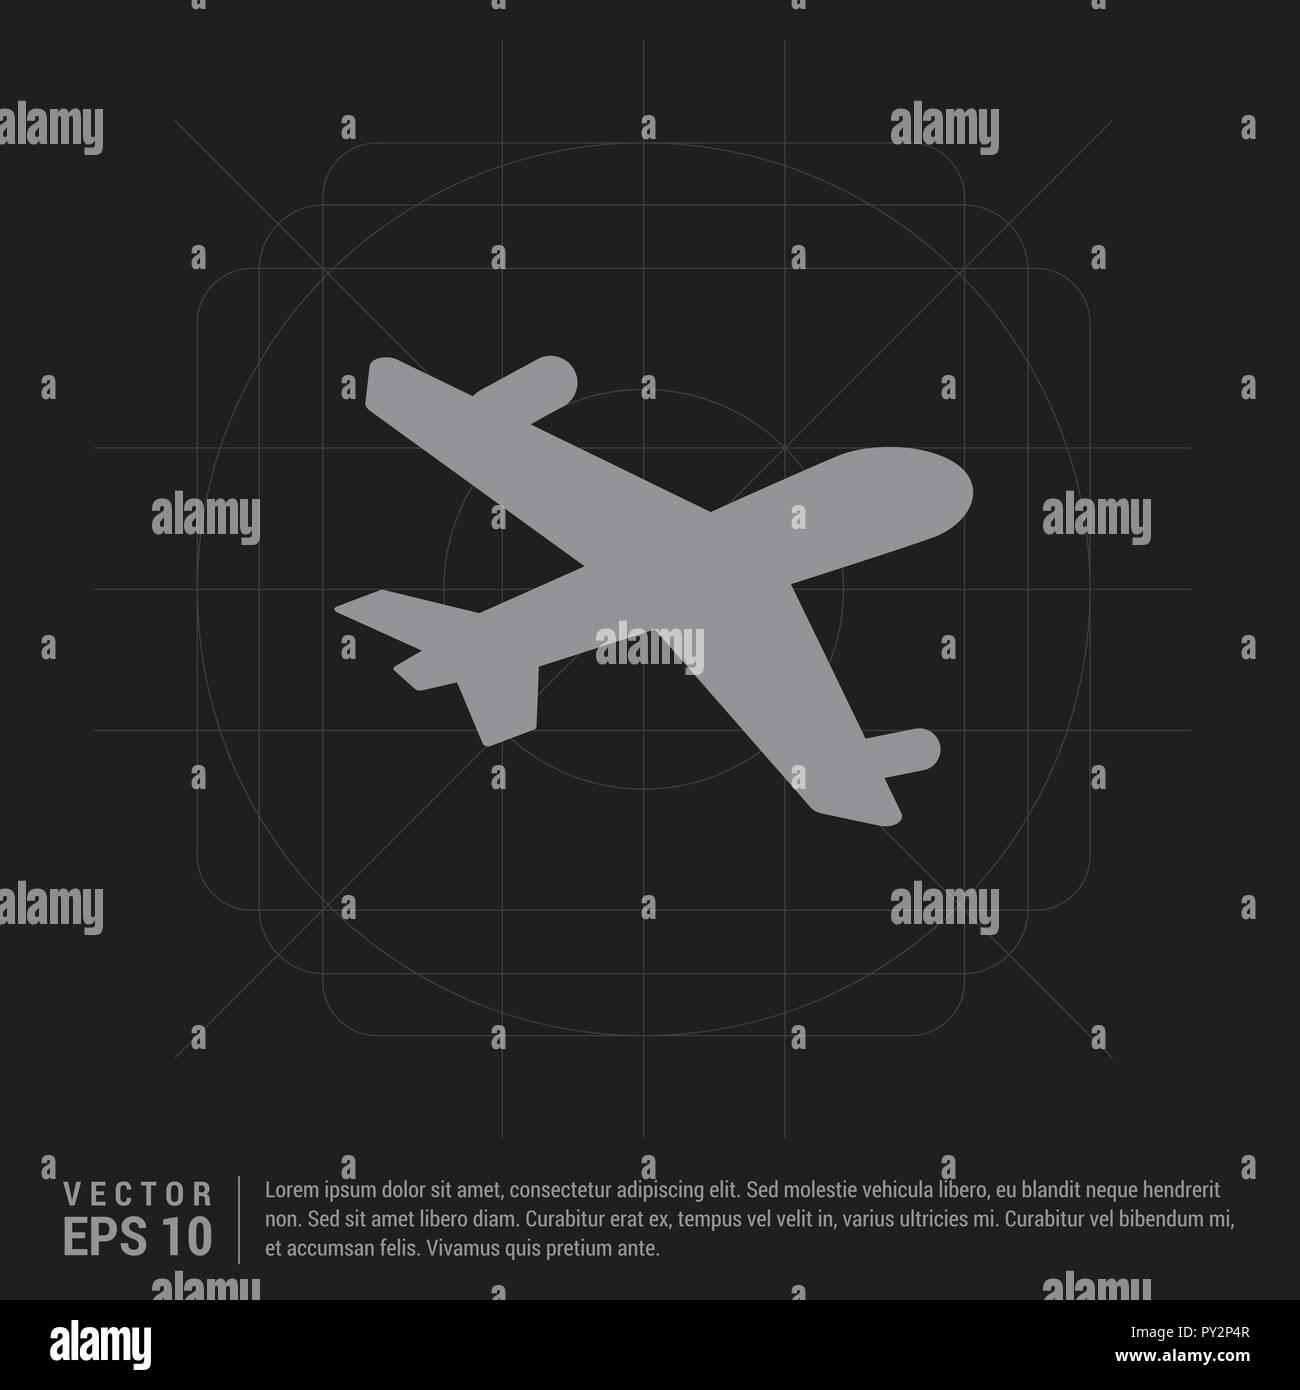 Aeroplane Icon Black Creative Background Free Vector Icon